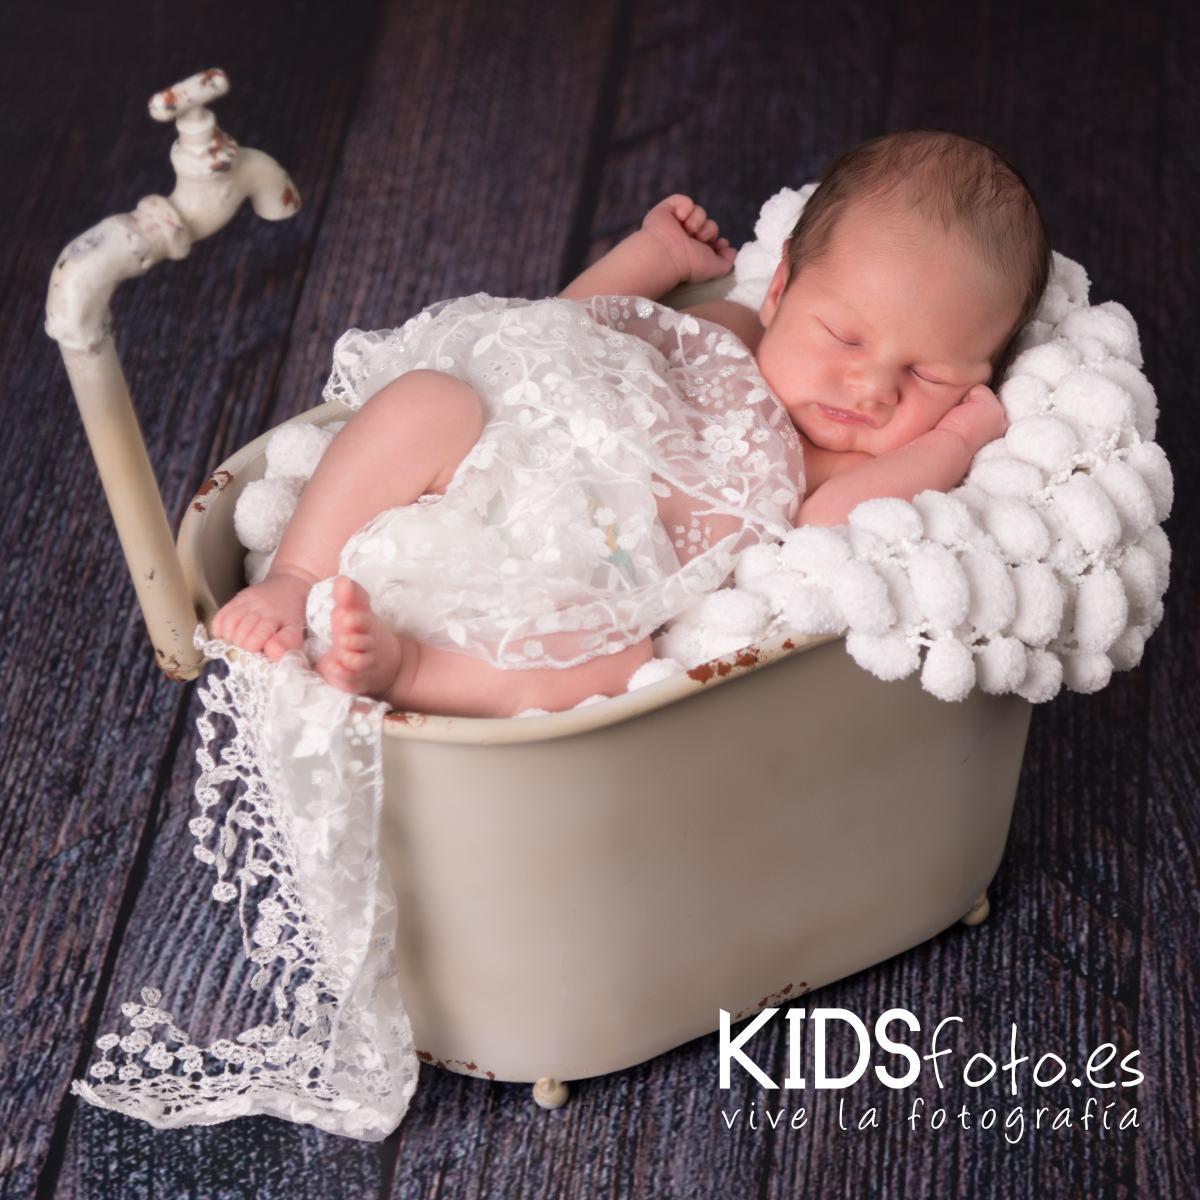 9e04a6471 Tarjeta regalo Reportaje Fotográfico NEWBORN Recién Nacido - kidsfoto.es